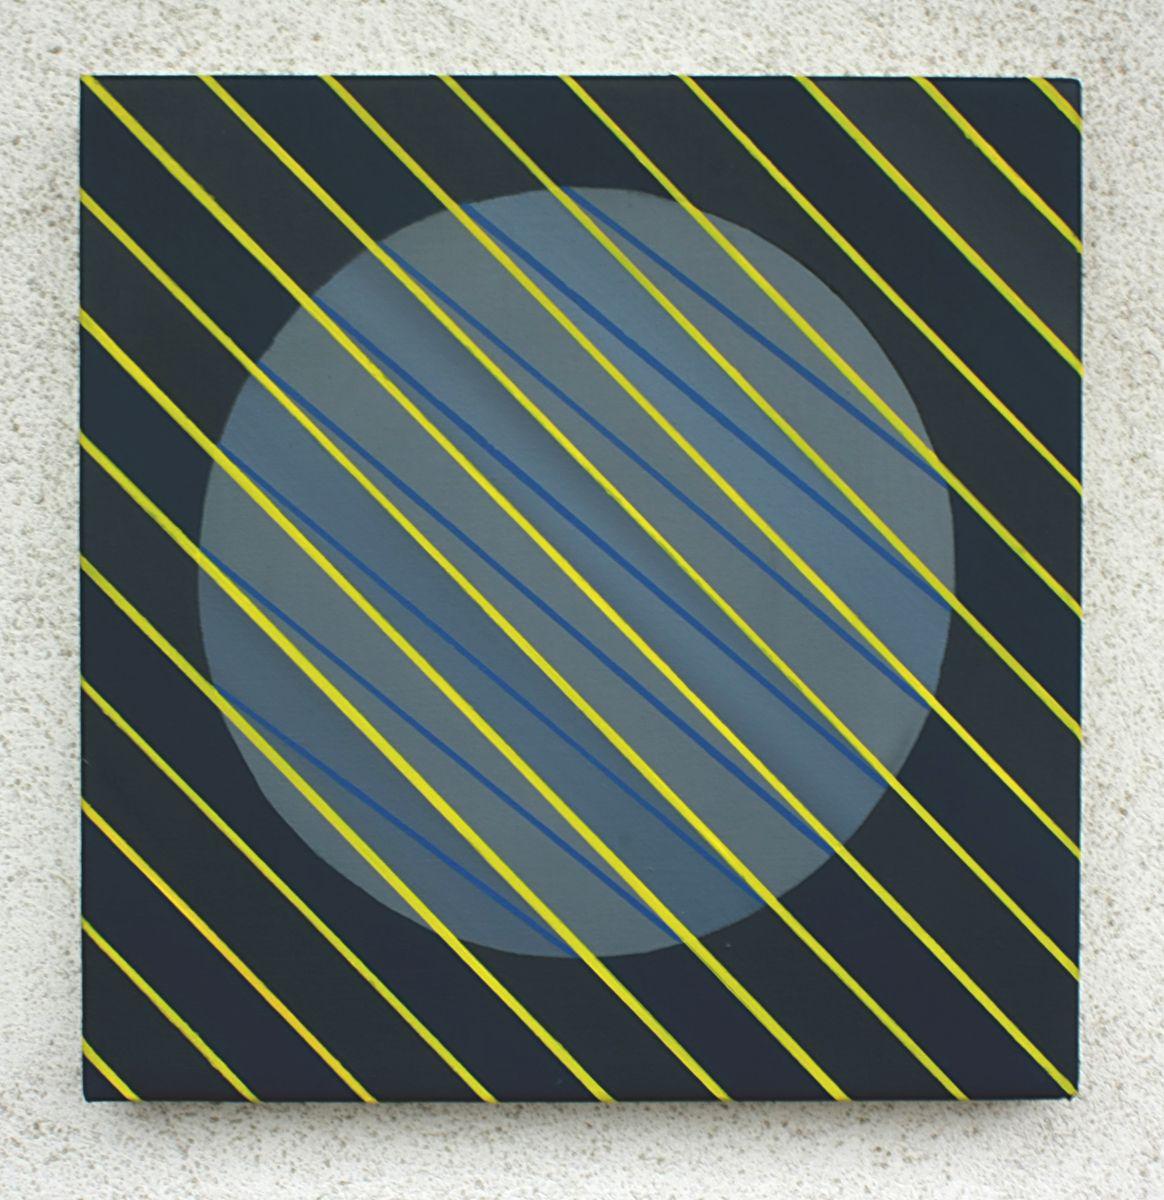 Diagonalen-Kreis-Christian Eder